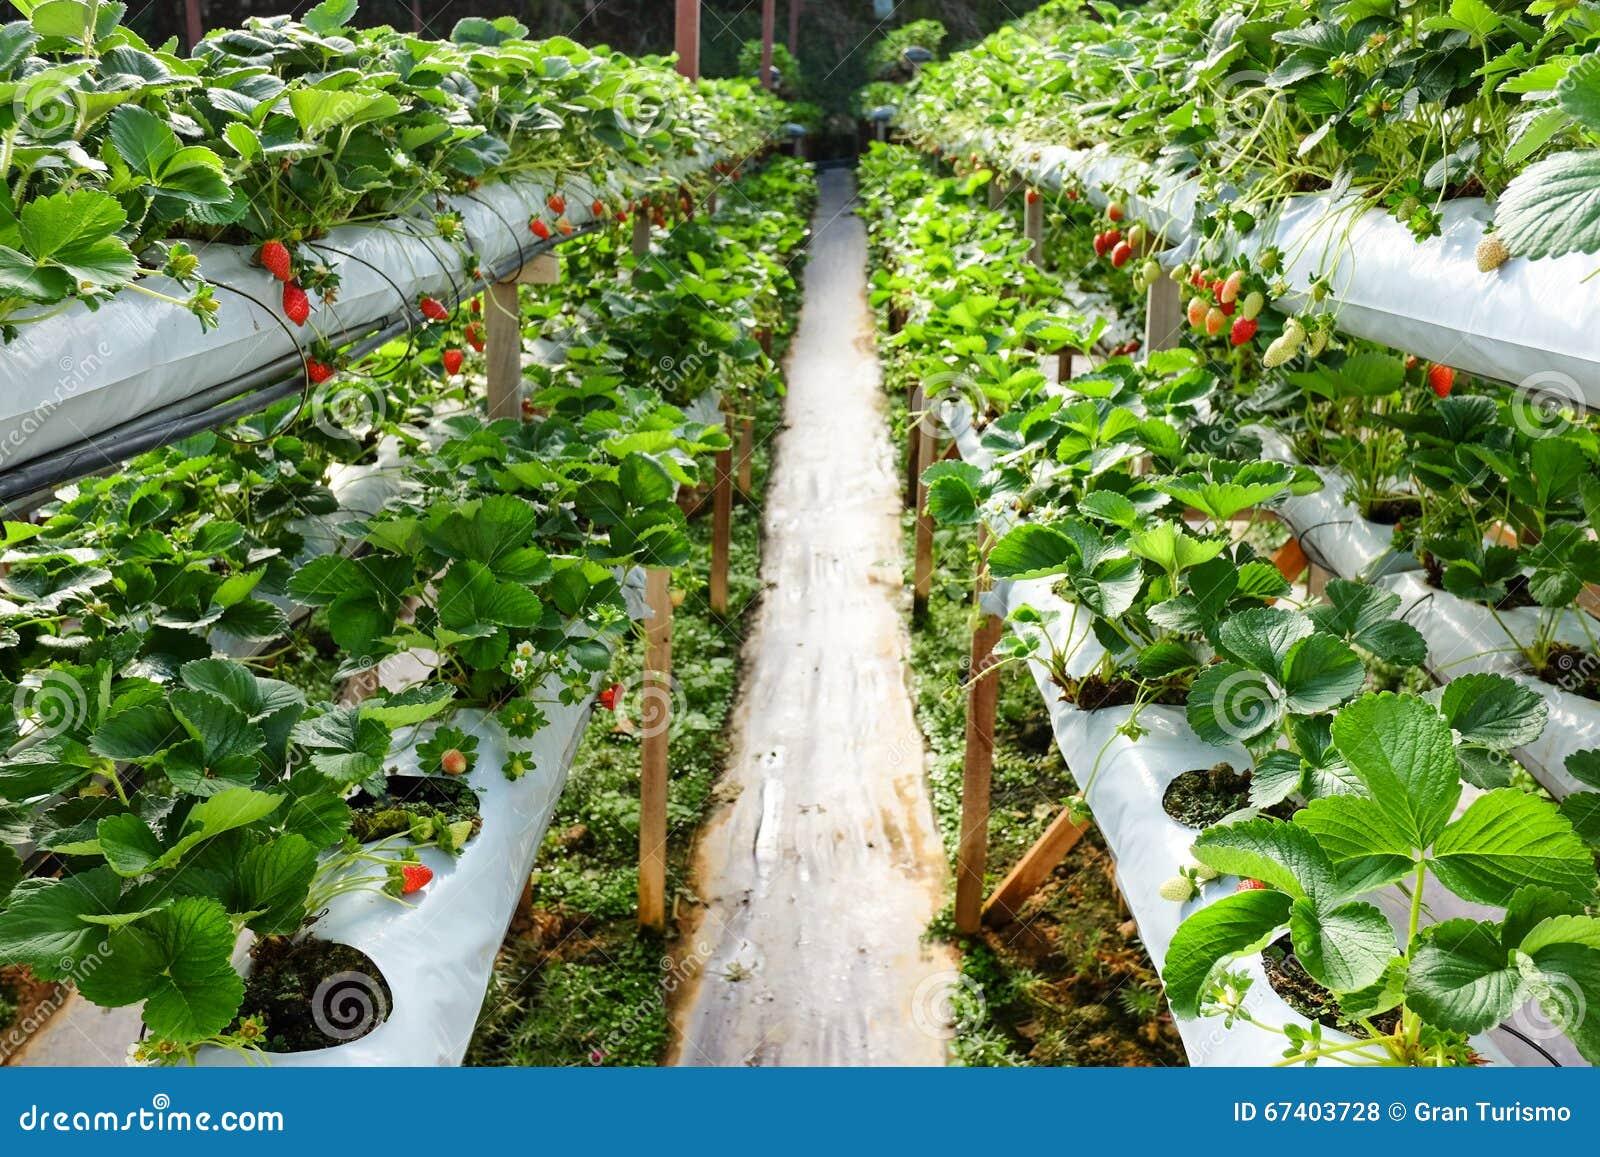 Comprehensive Business Plan for Vegetable Farming